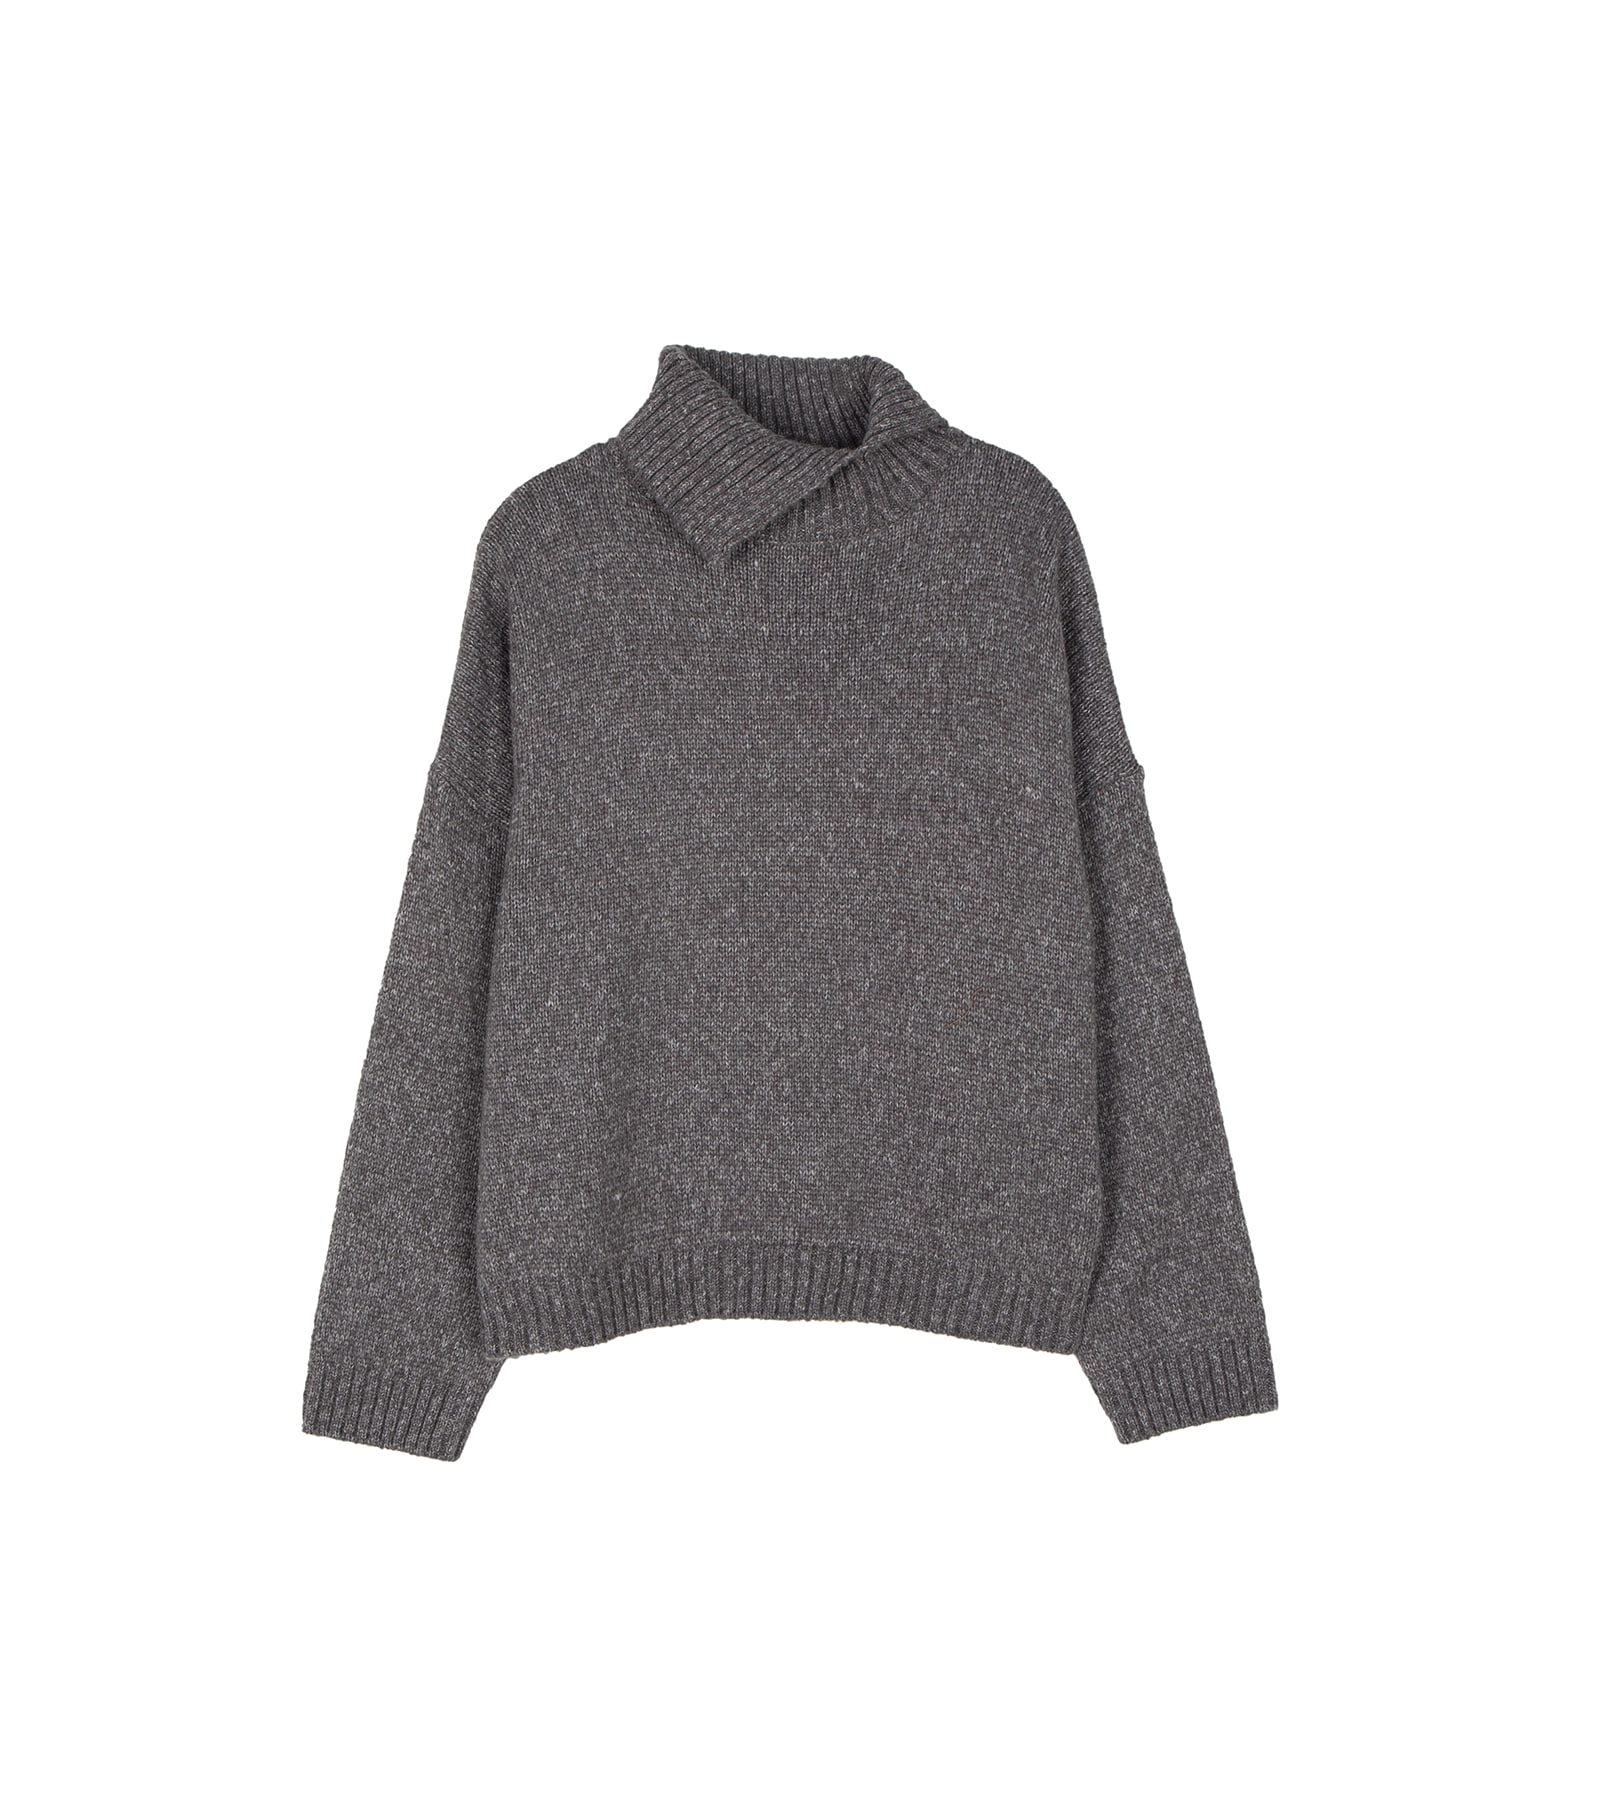 Shading slit turtleneck knit